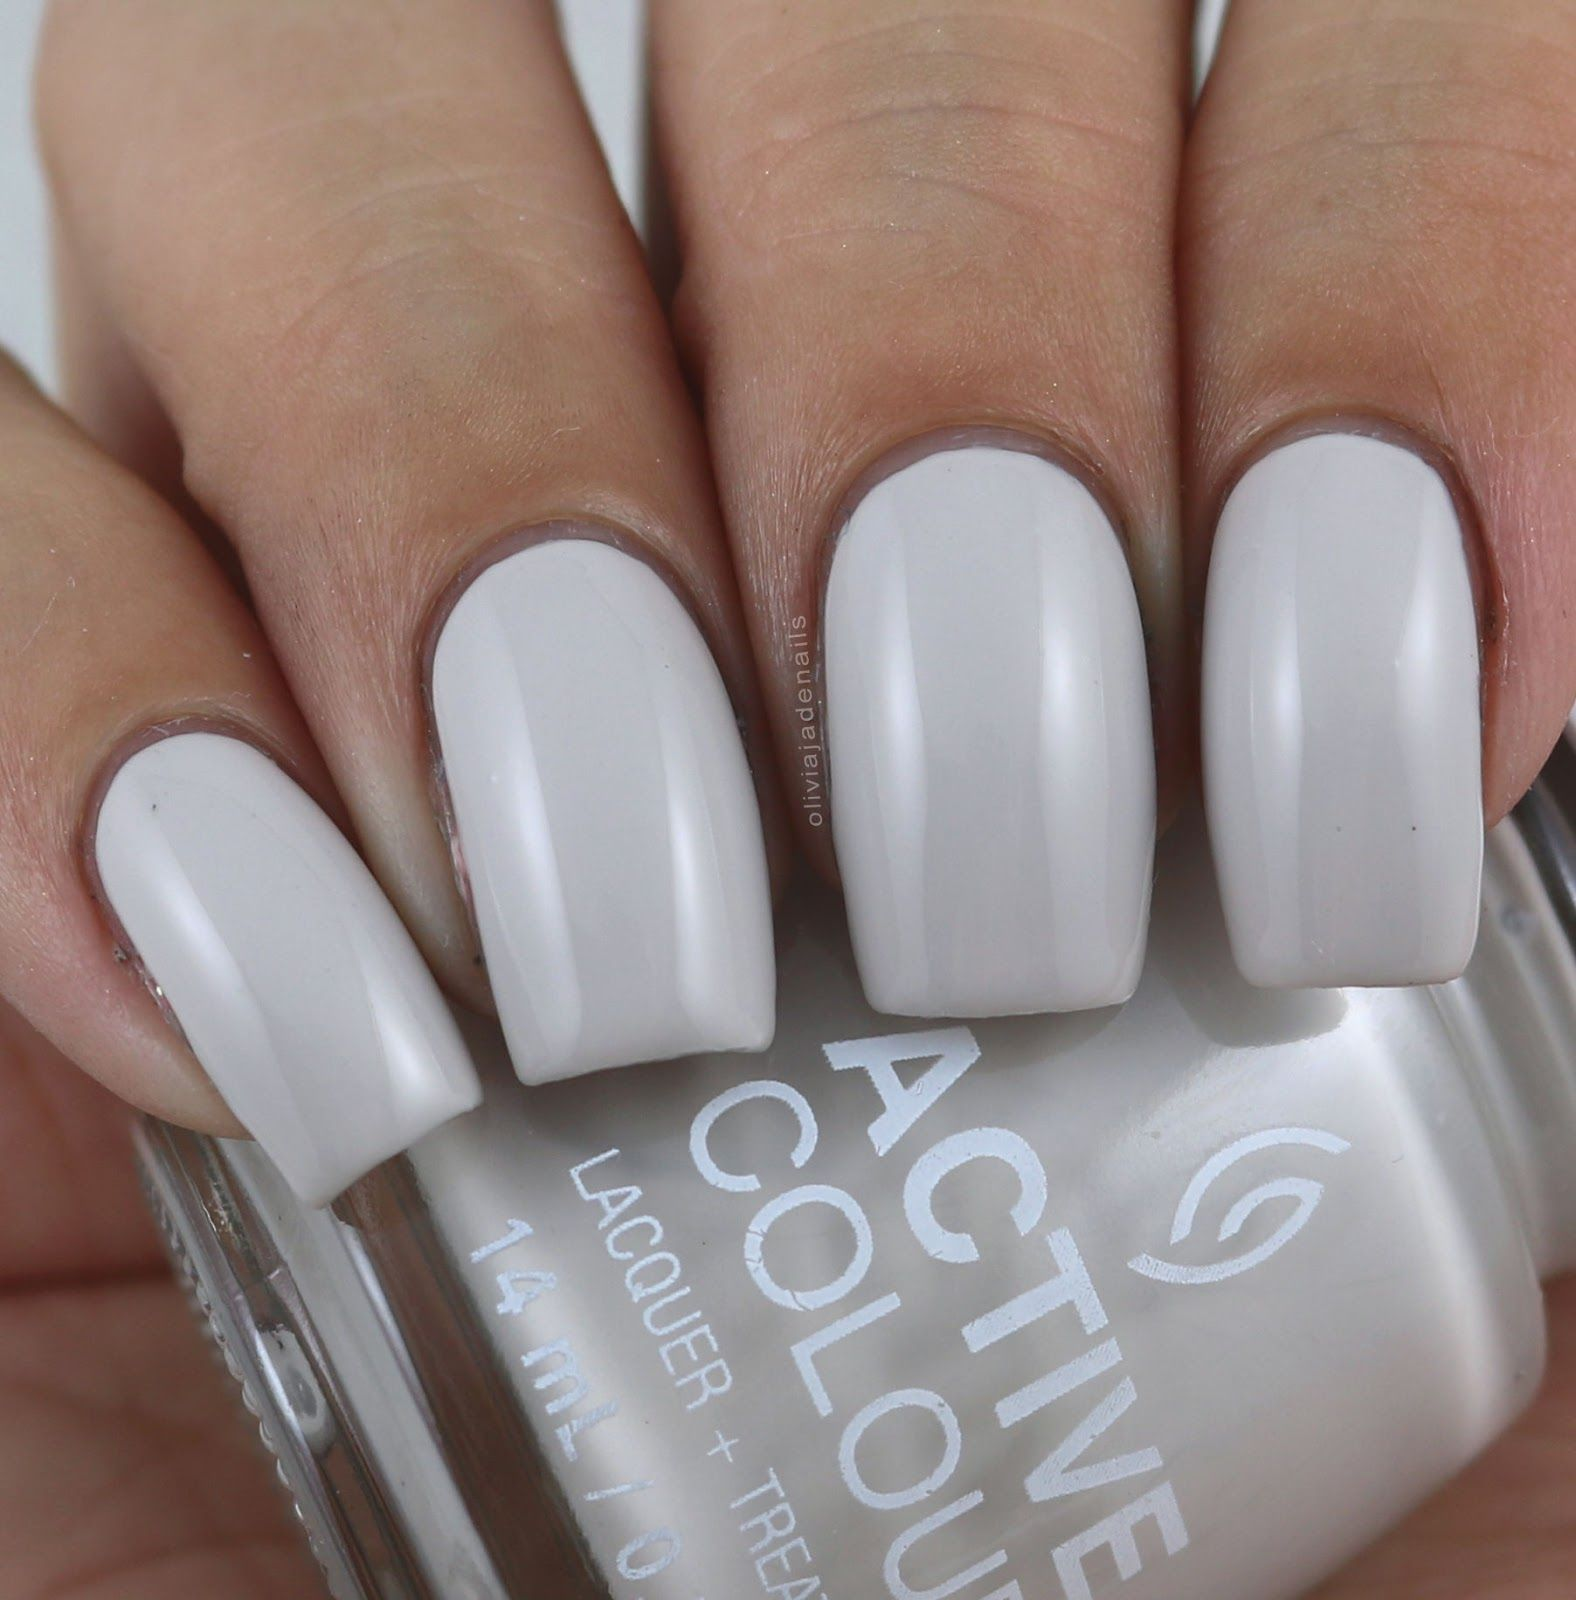 China Glaze Grey Nail Polish: China Glaze Set In Greystone (mini) Swatched By Olivia